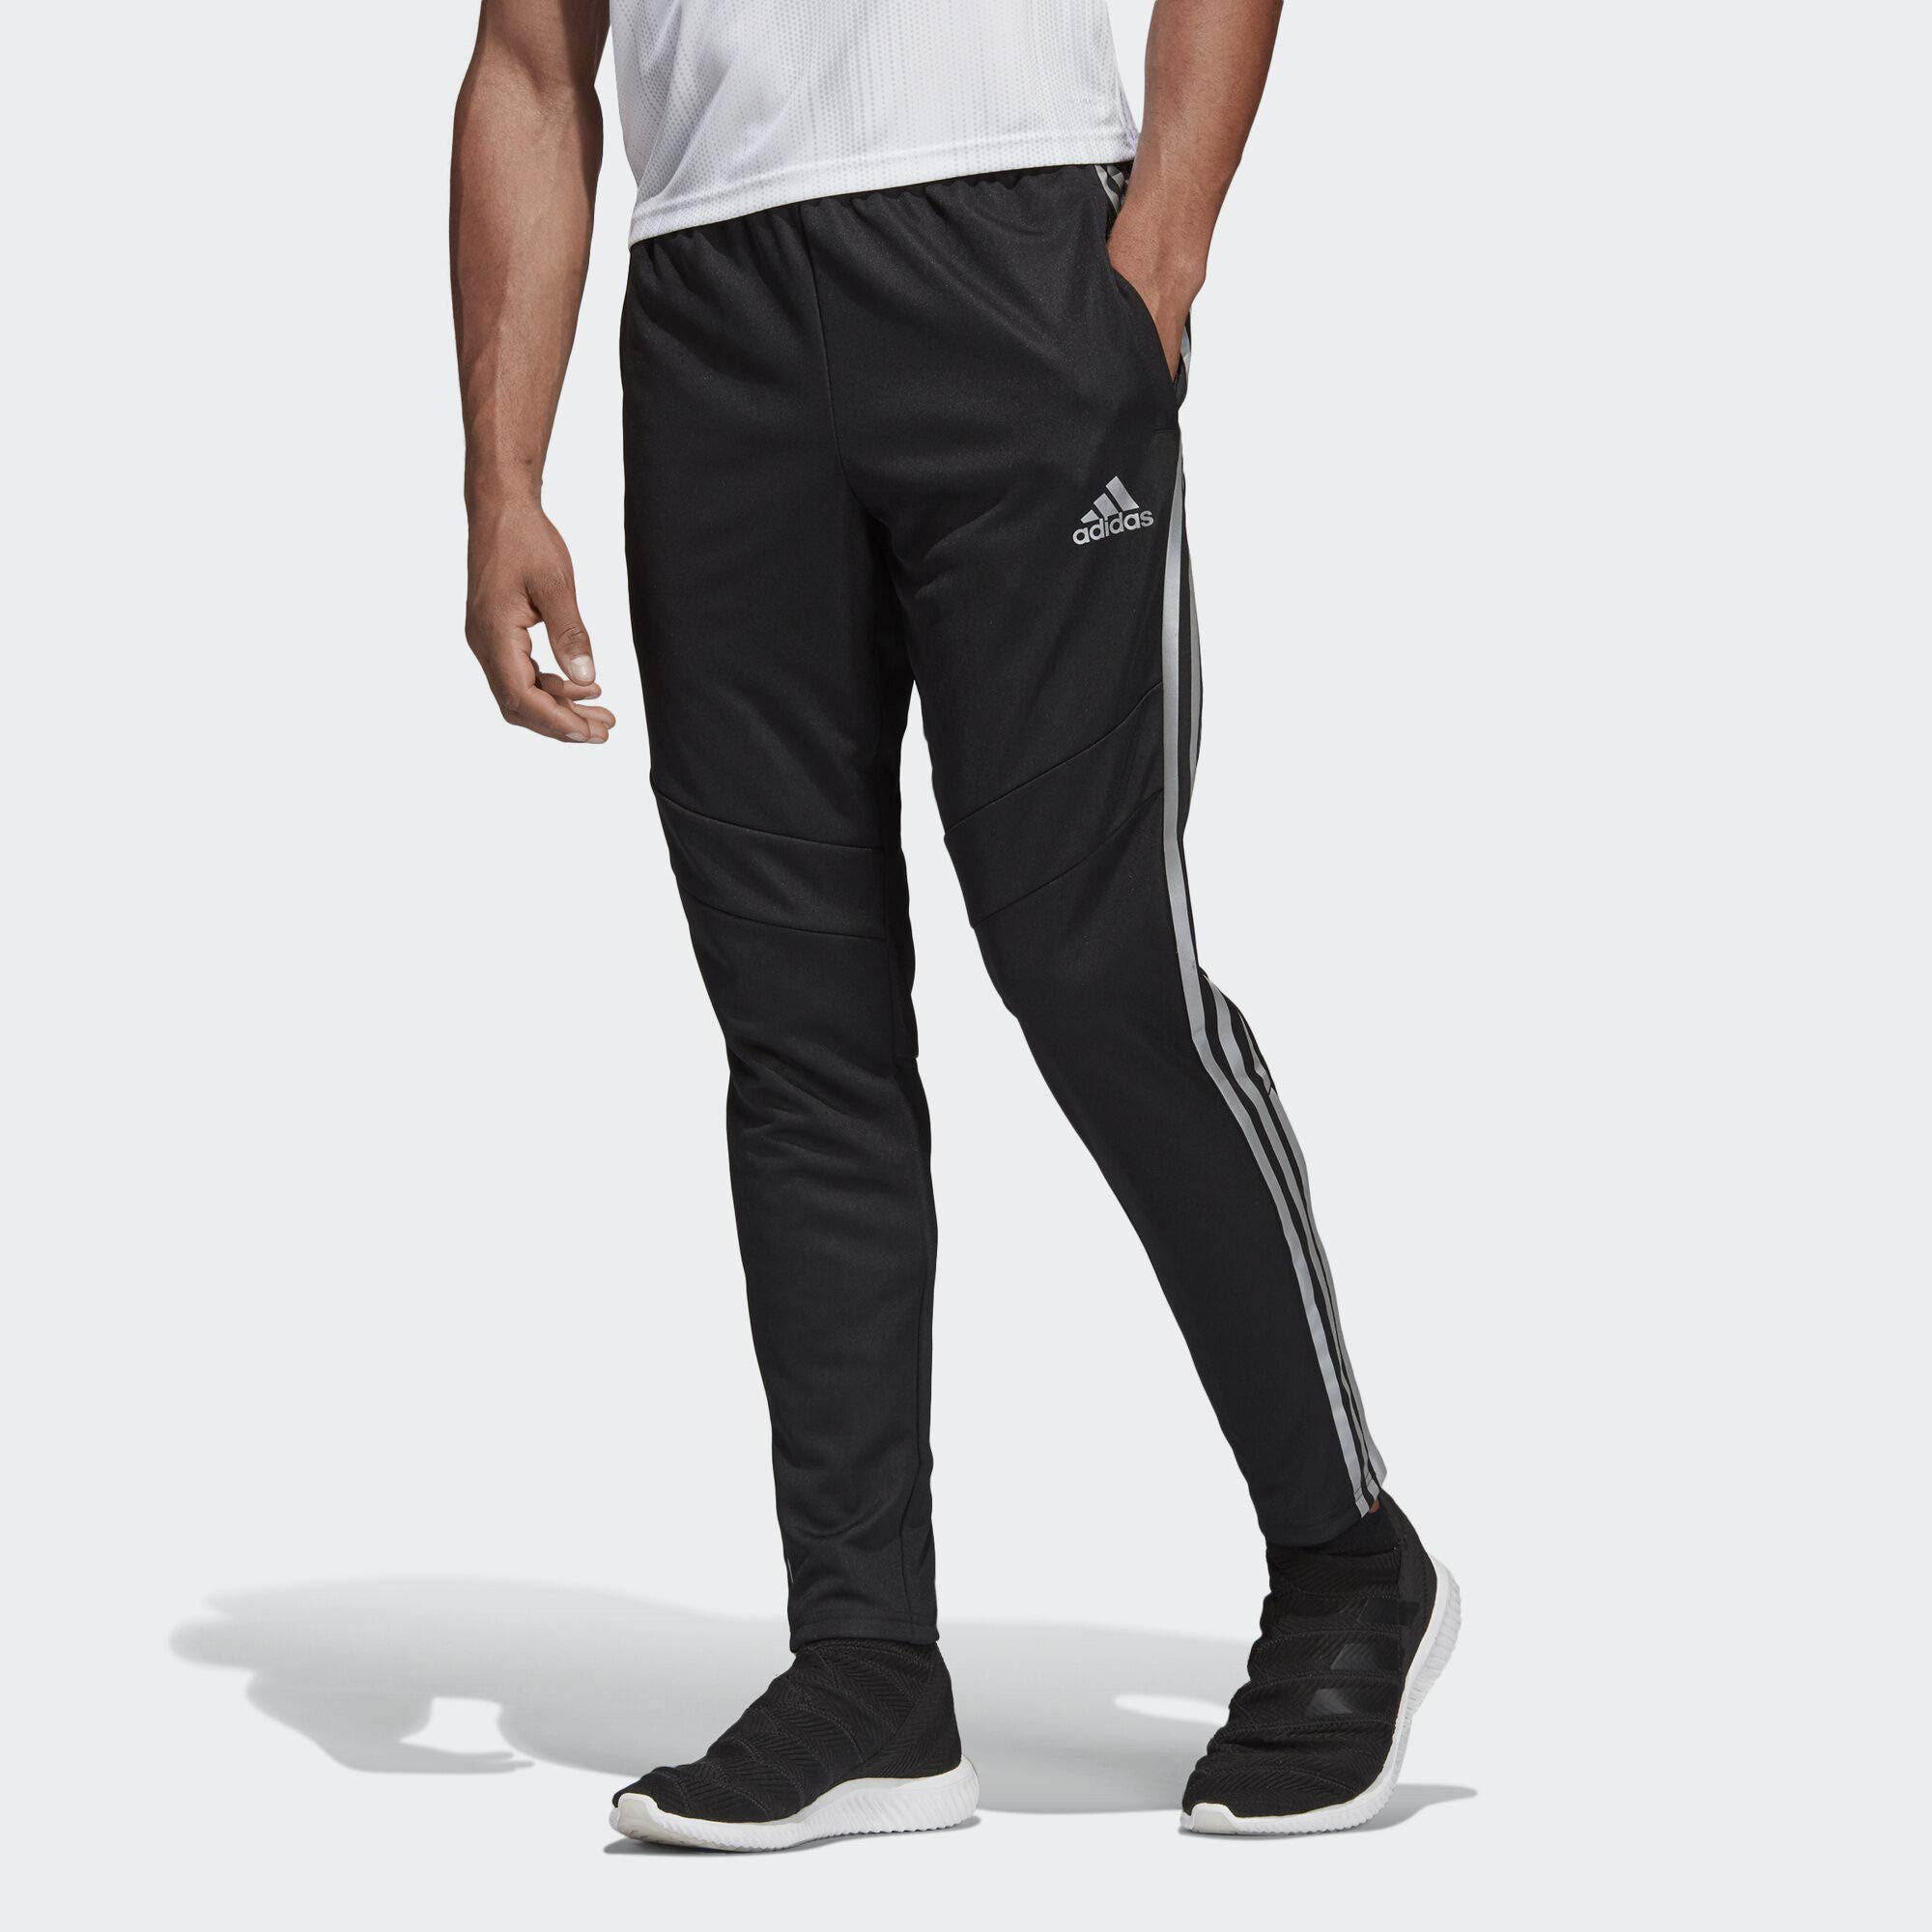 adidas Men's Tiro 19 Training Soccer Pants, Tiro '19 Pants, Black/Reflective Silver, Medium by adidas